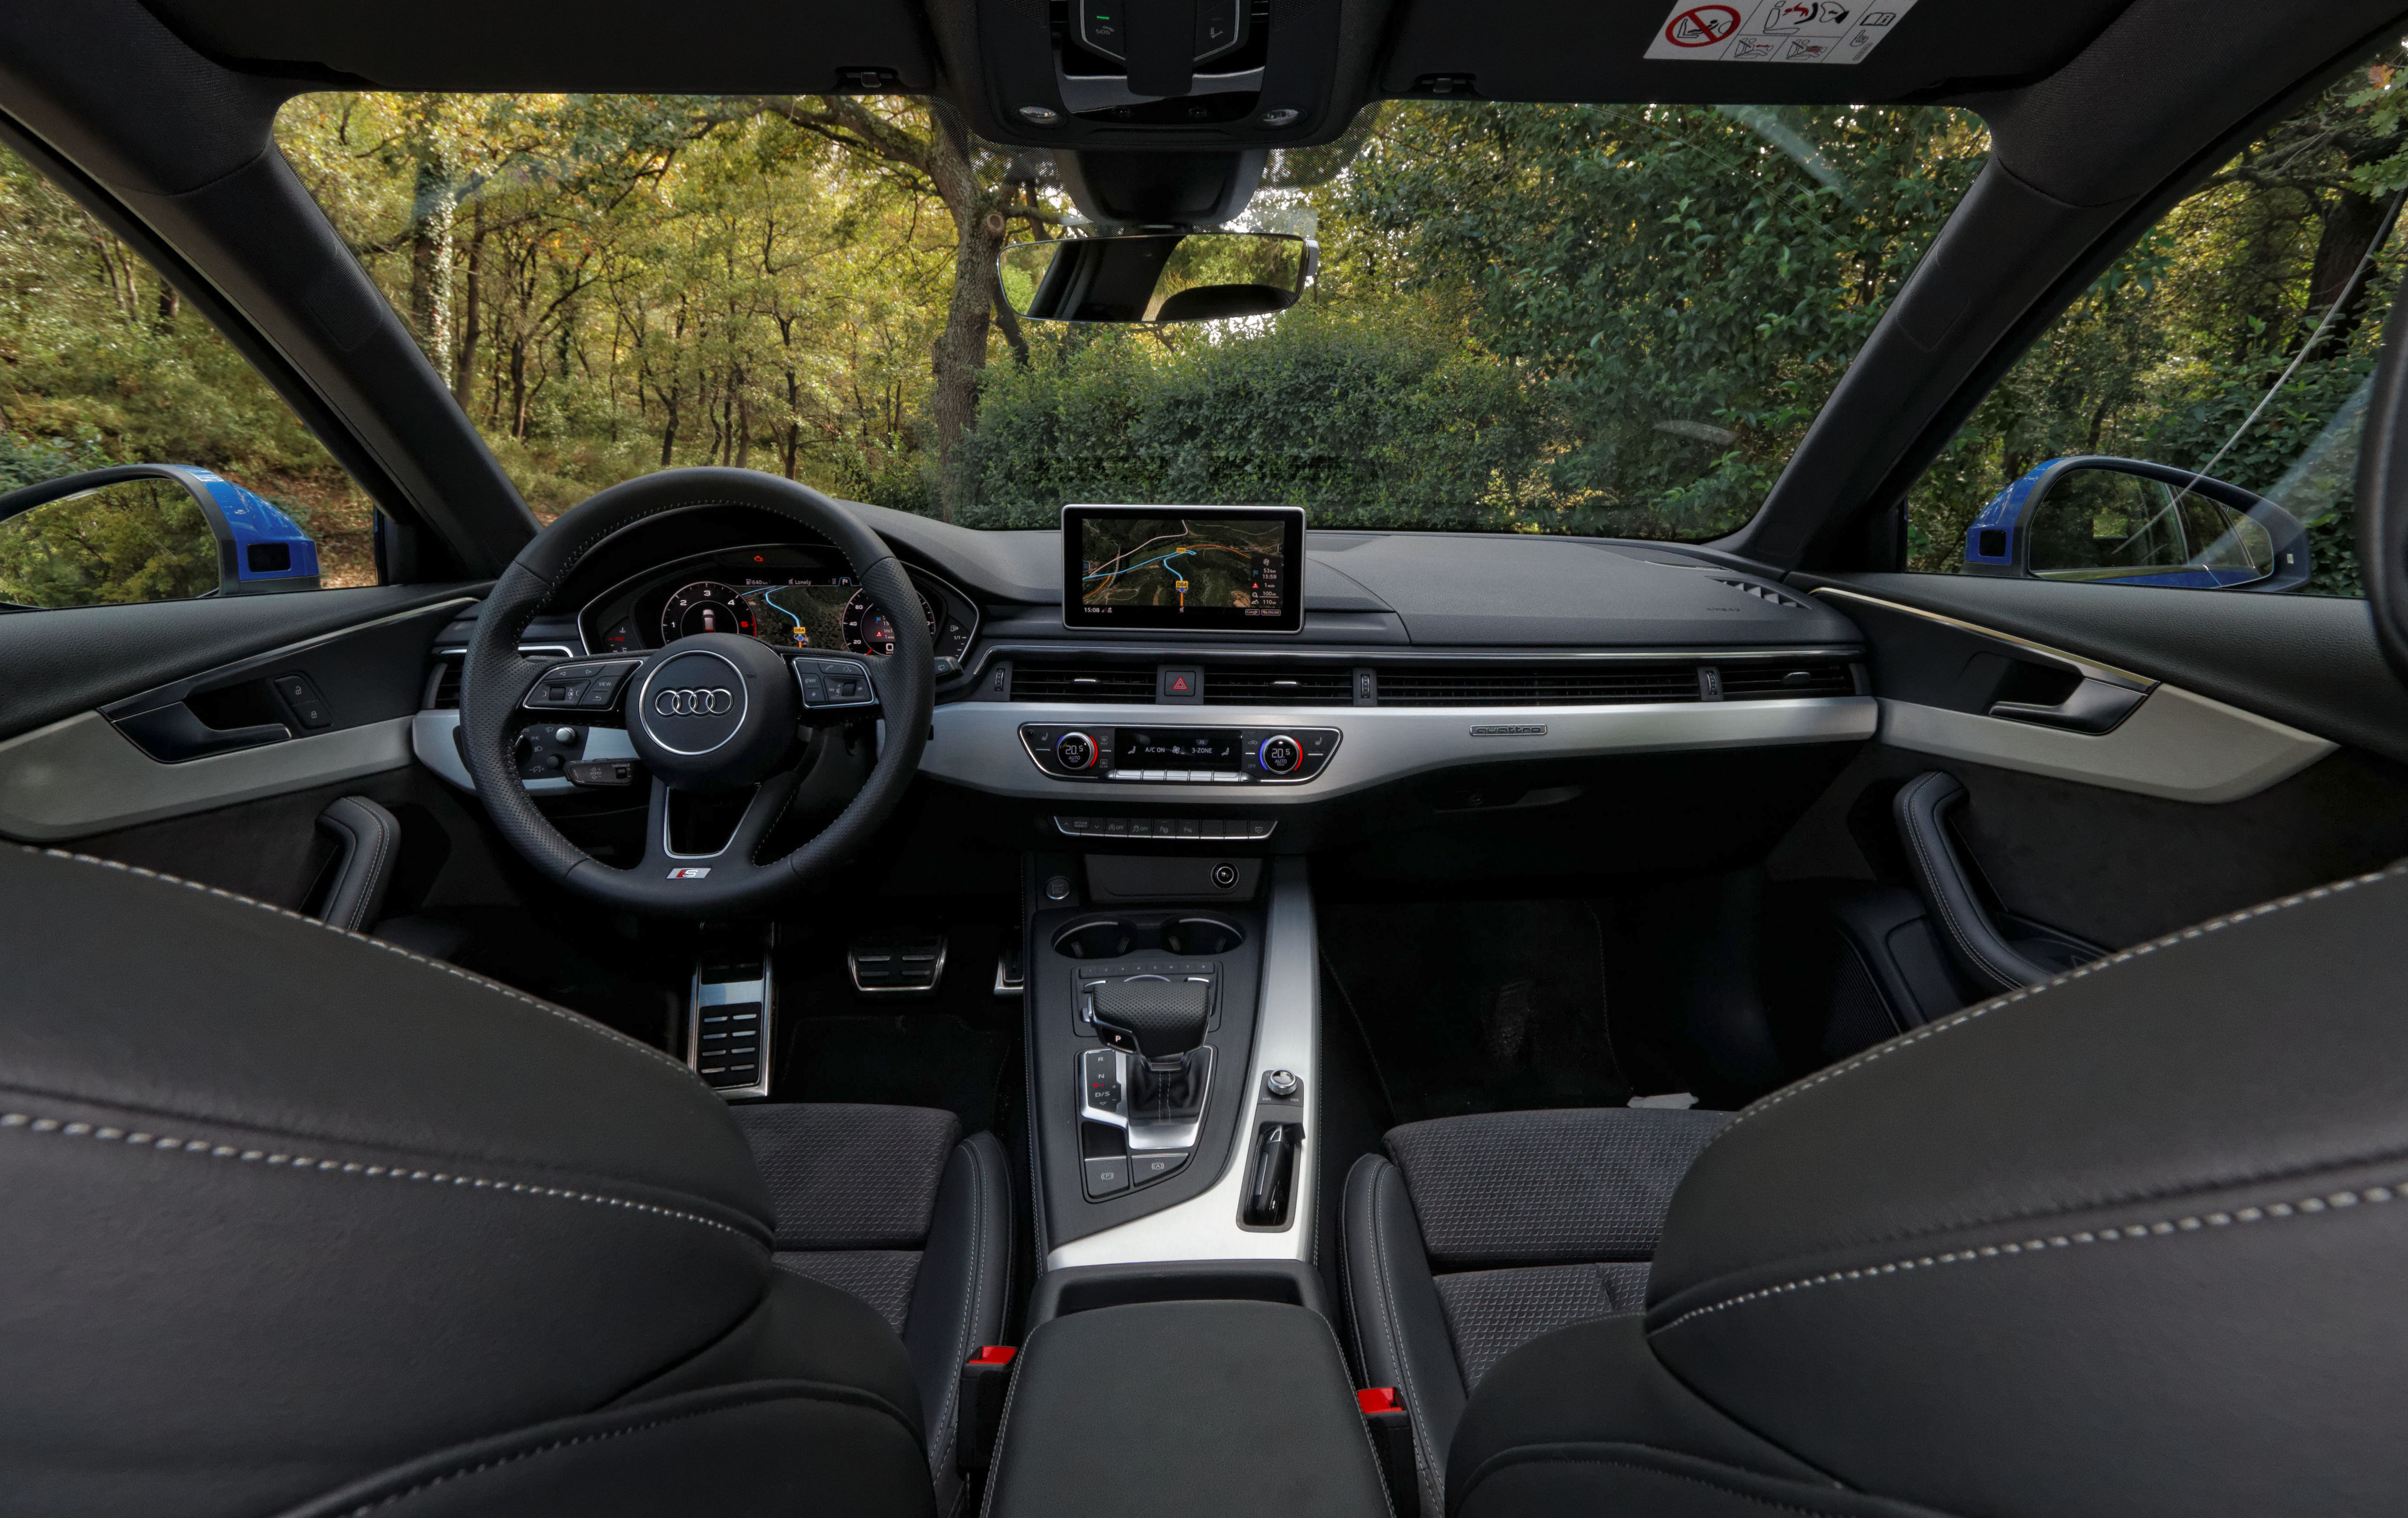 Essai Vid 233 O Audi A4 Avant Apparences Trompeuses